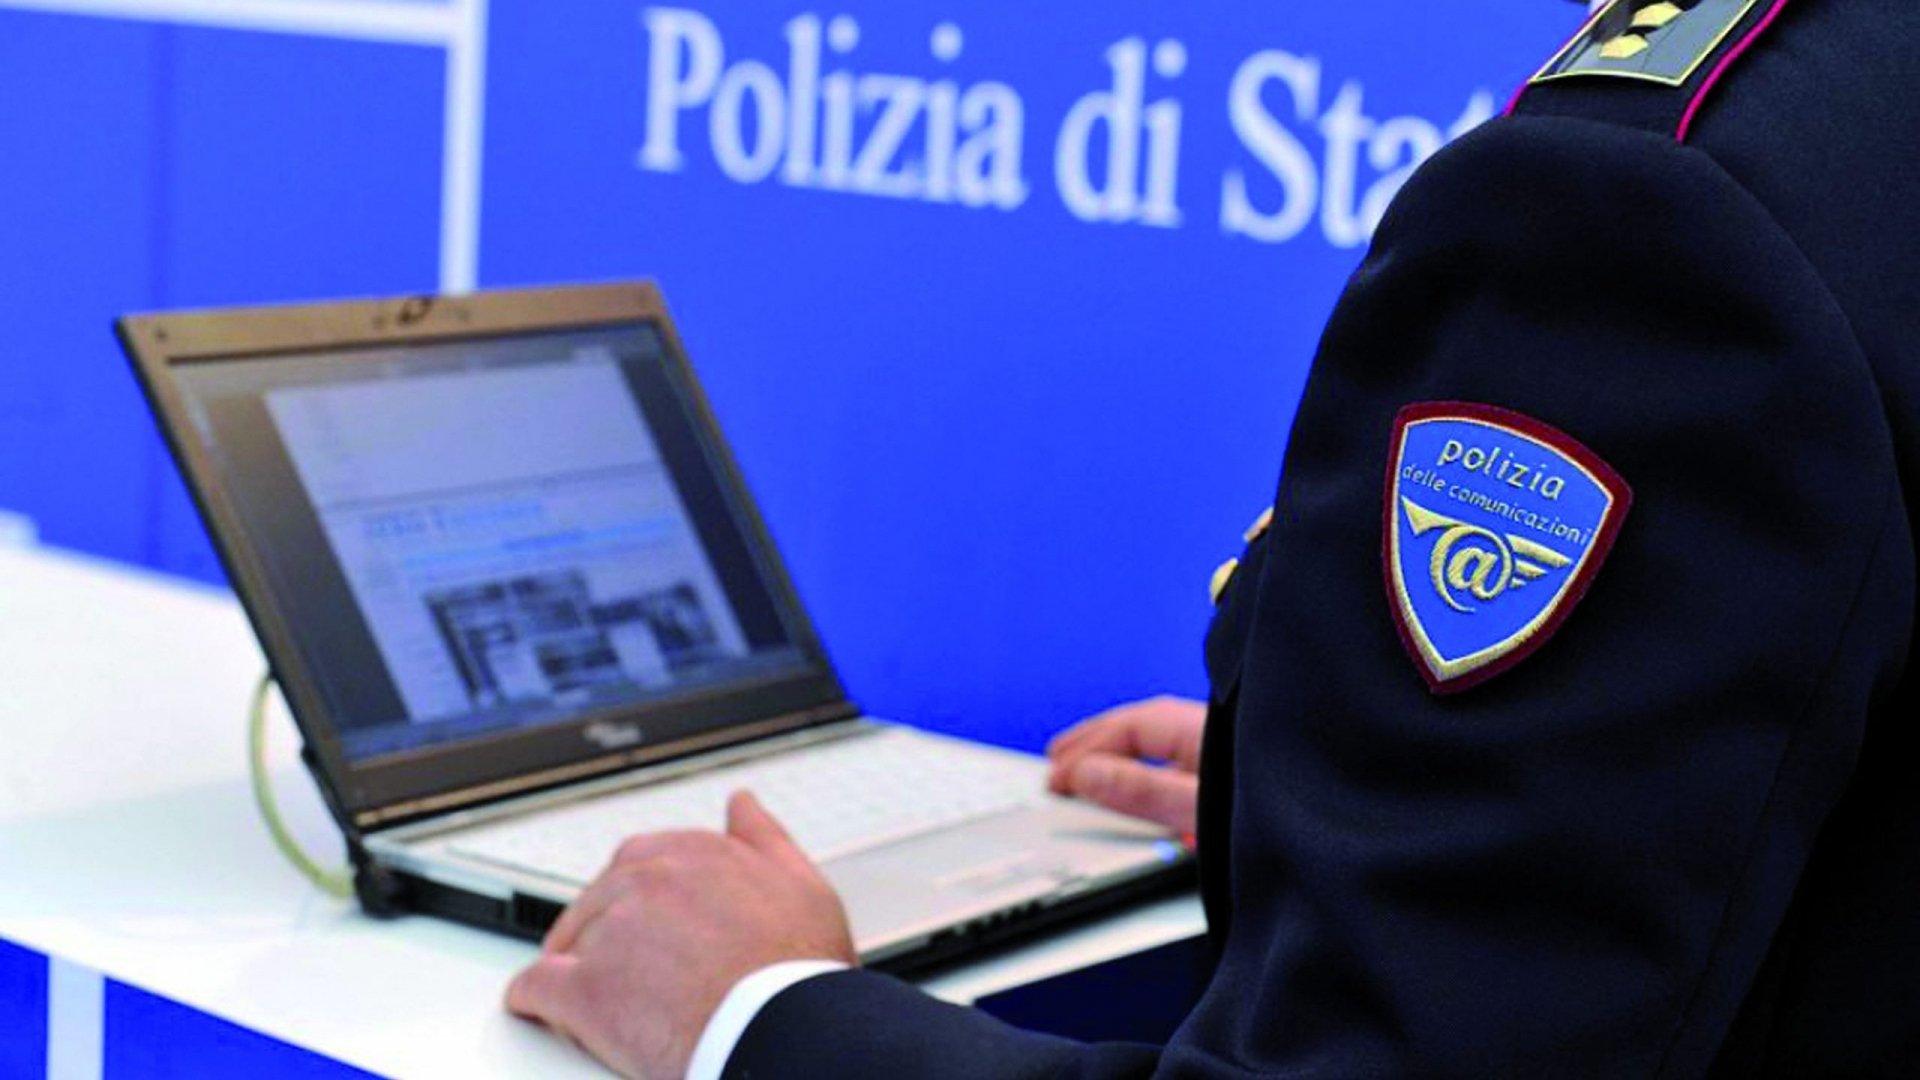 Lancia sfida estrema su Tik Tok, denunciata influencer siciliana